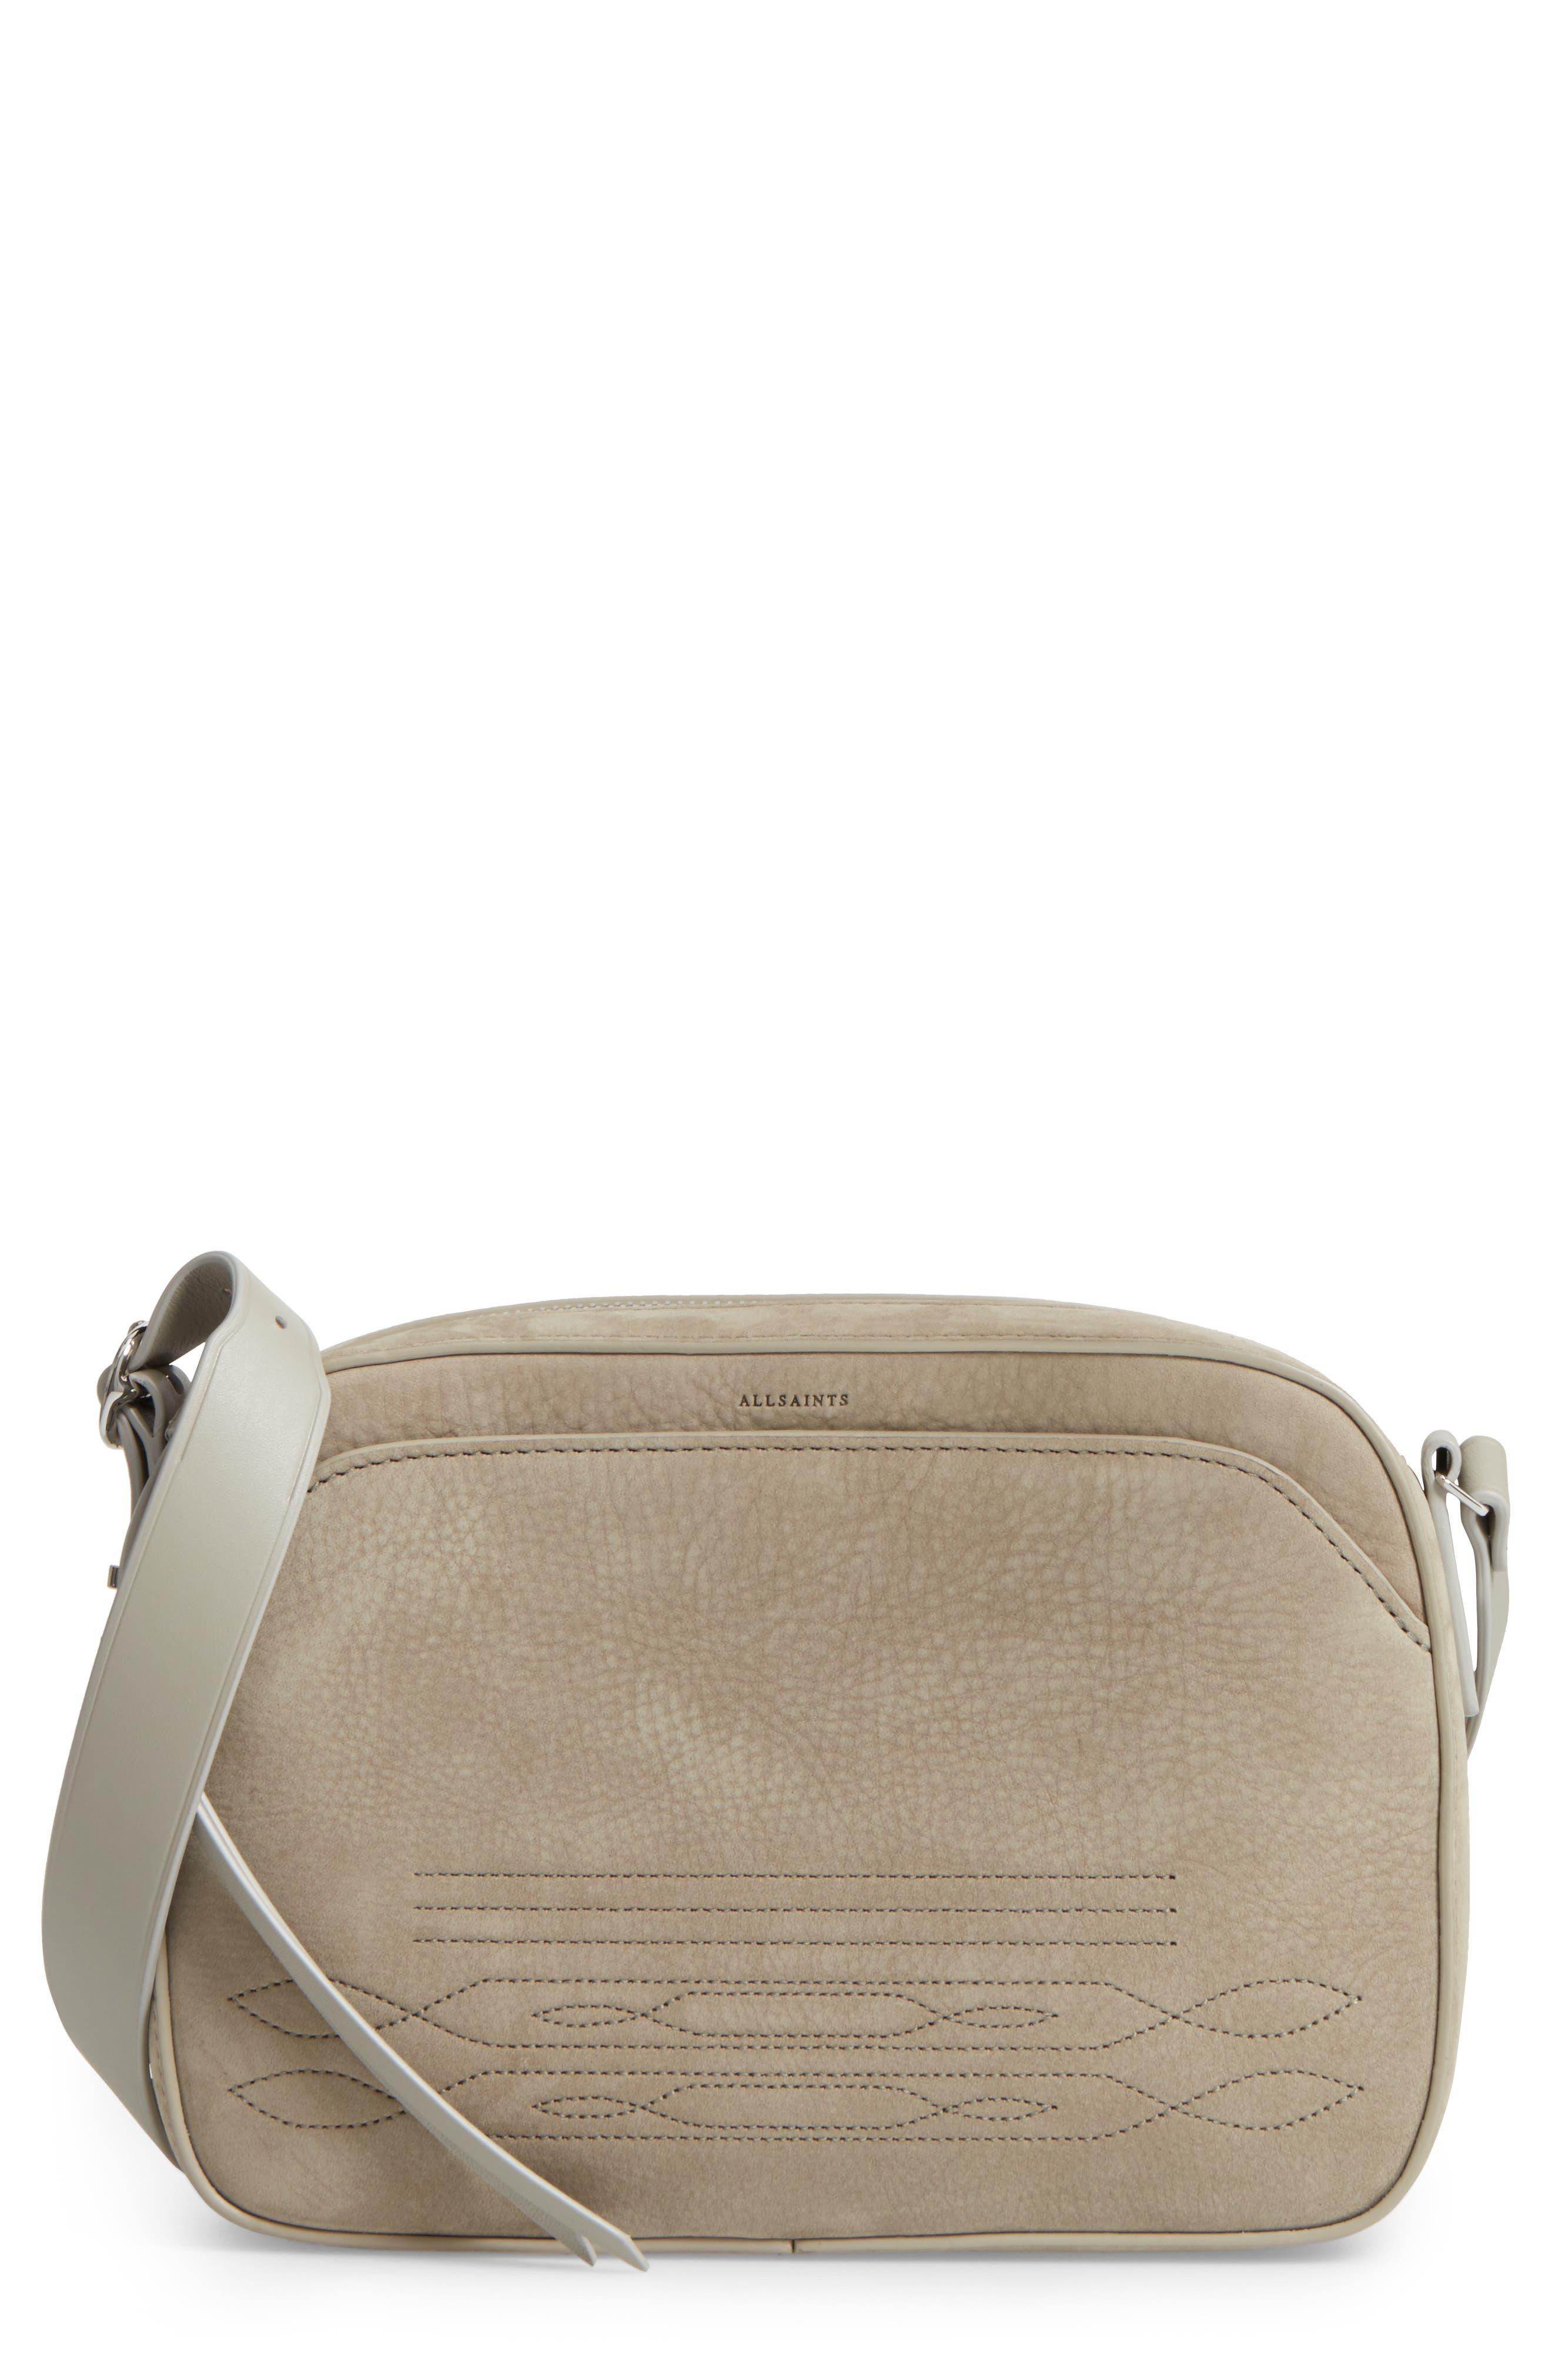 Cooper Nubuck Leather Shoulder Bag,                             Main thumbnail 1, color,                             Light Cement Grey